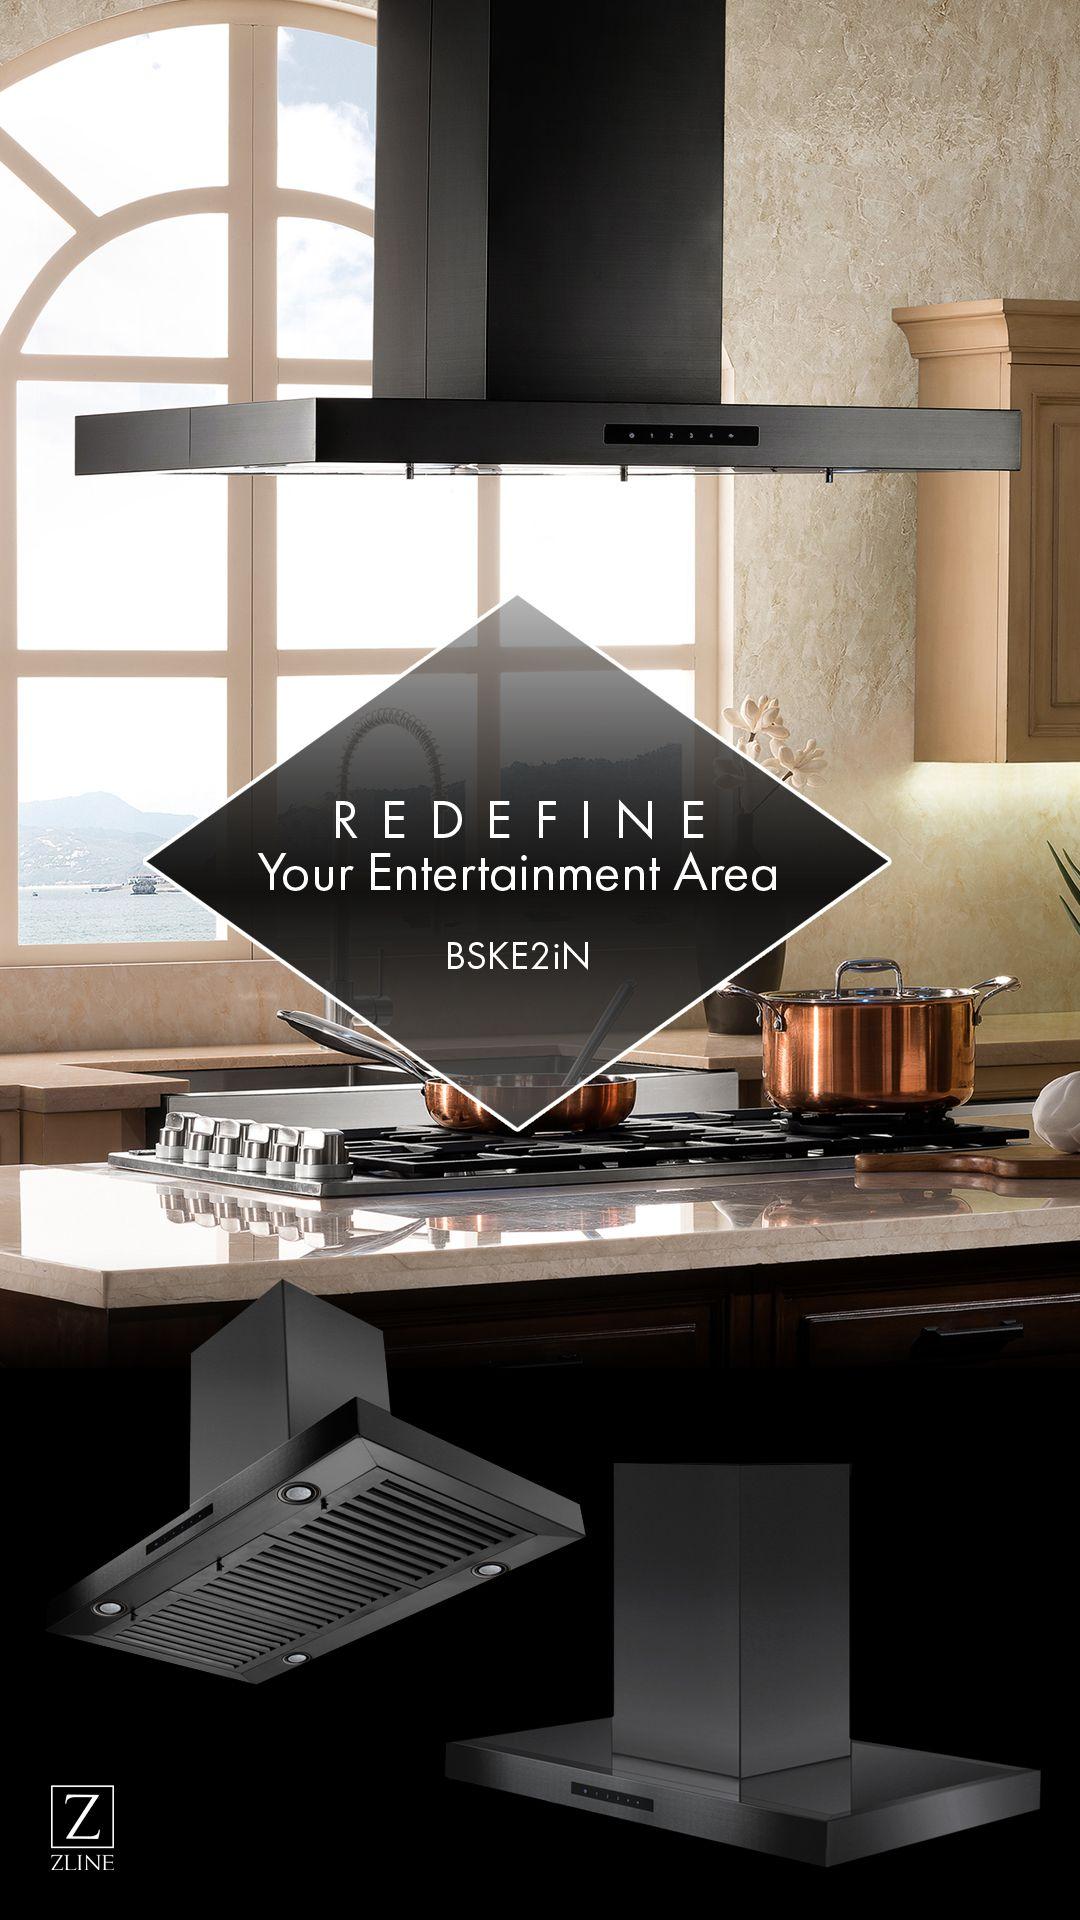 Redefine Your Entertainment Area Zline Black Stainless Island Range Hood Stainless Steel Range Hood Kitchen Range Hood Range Hood